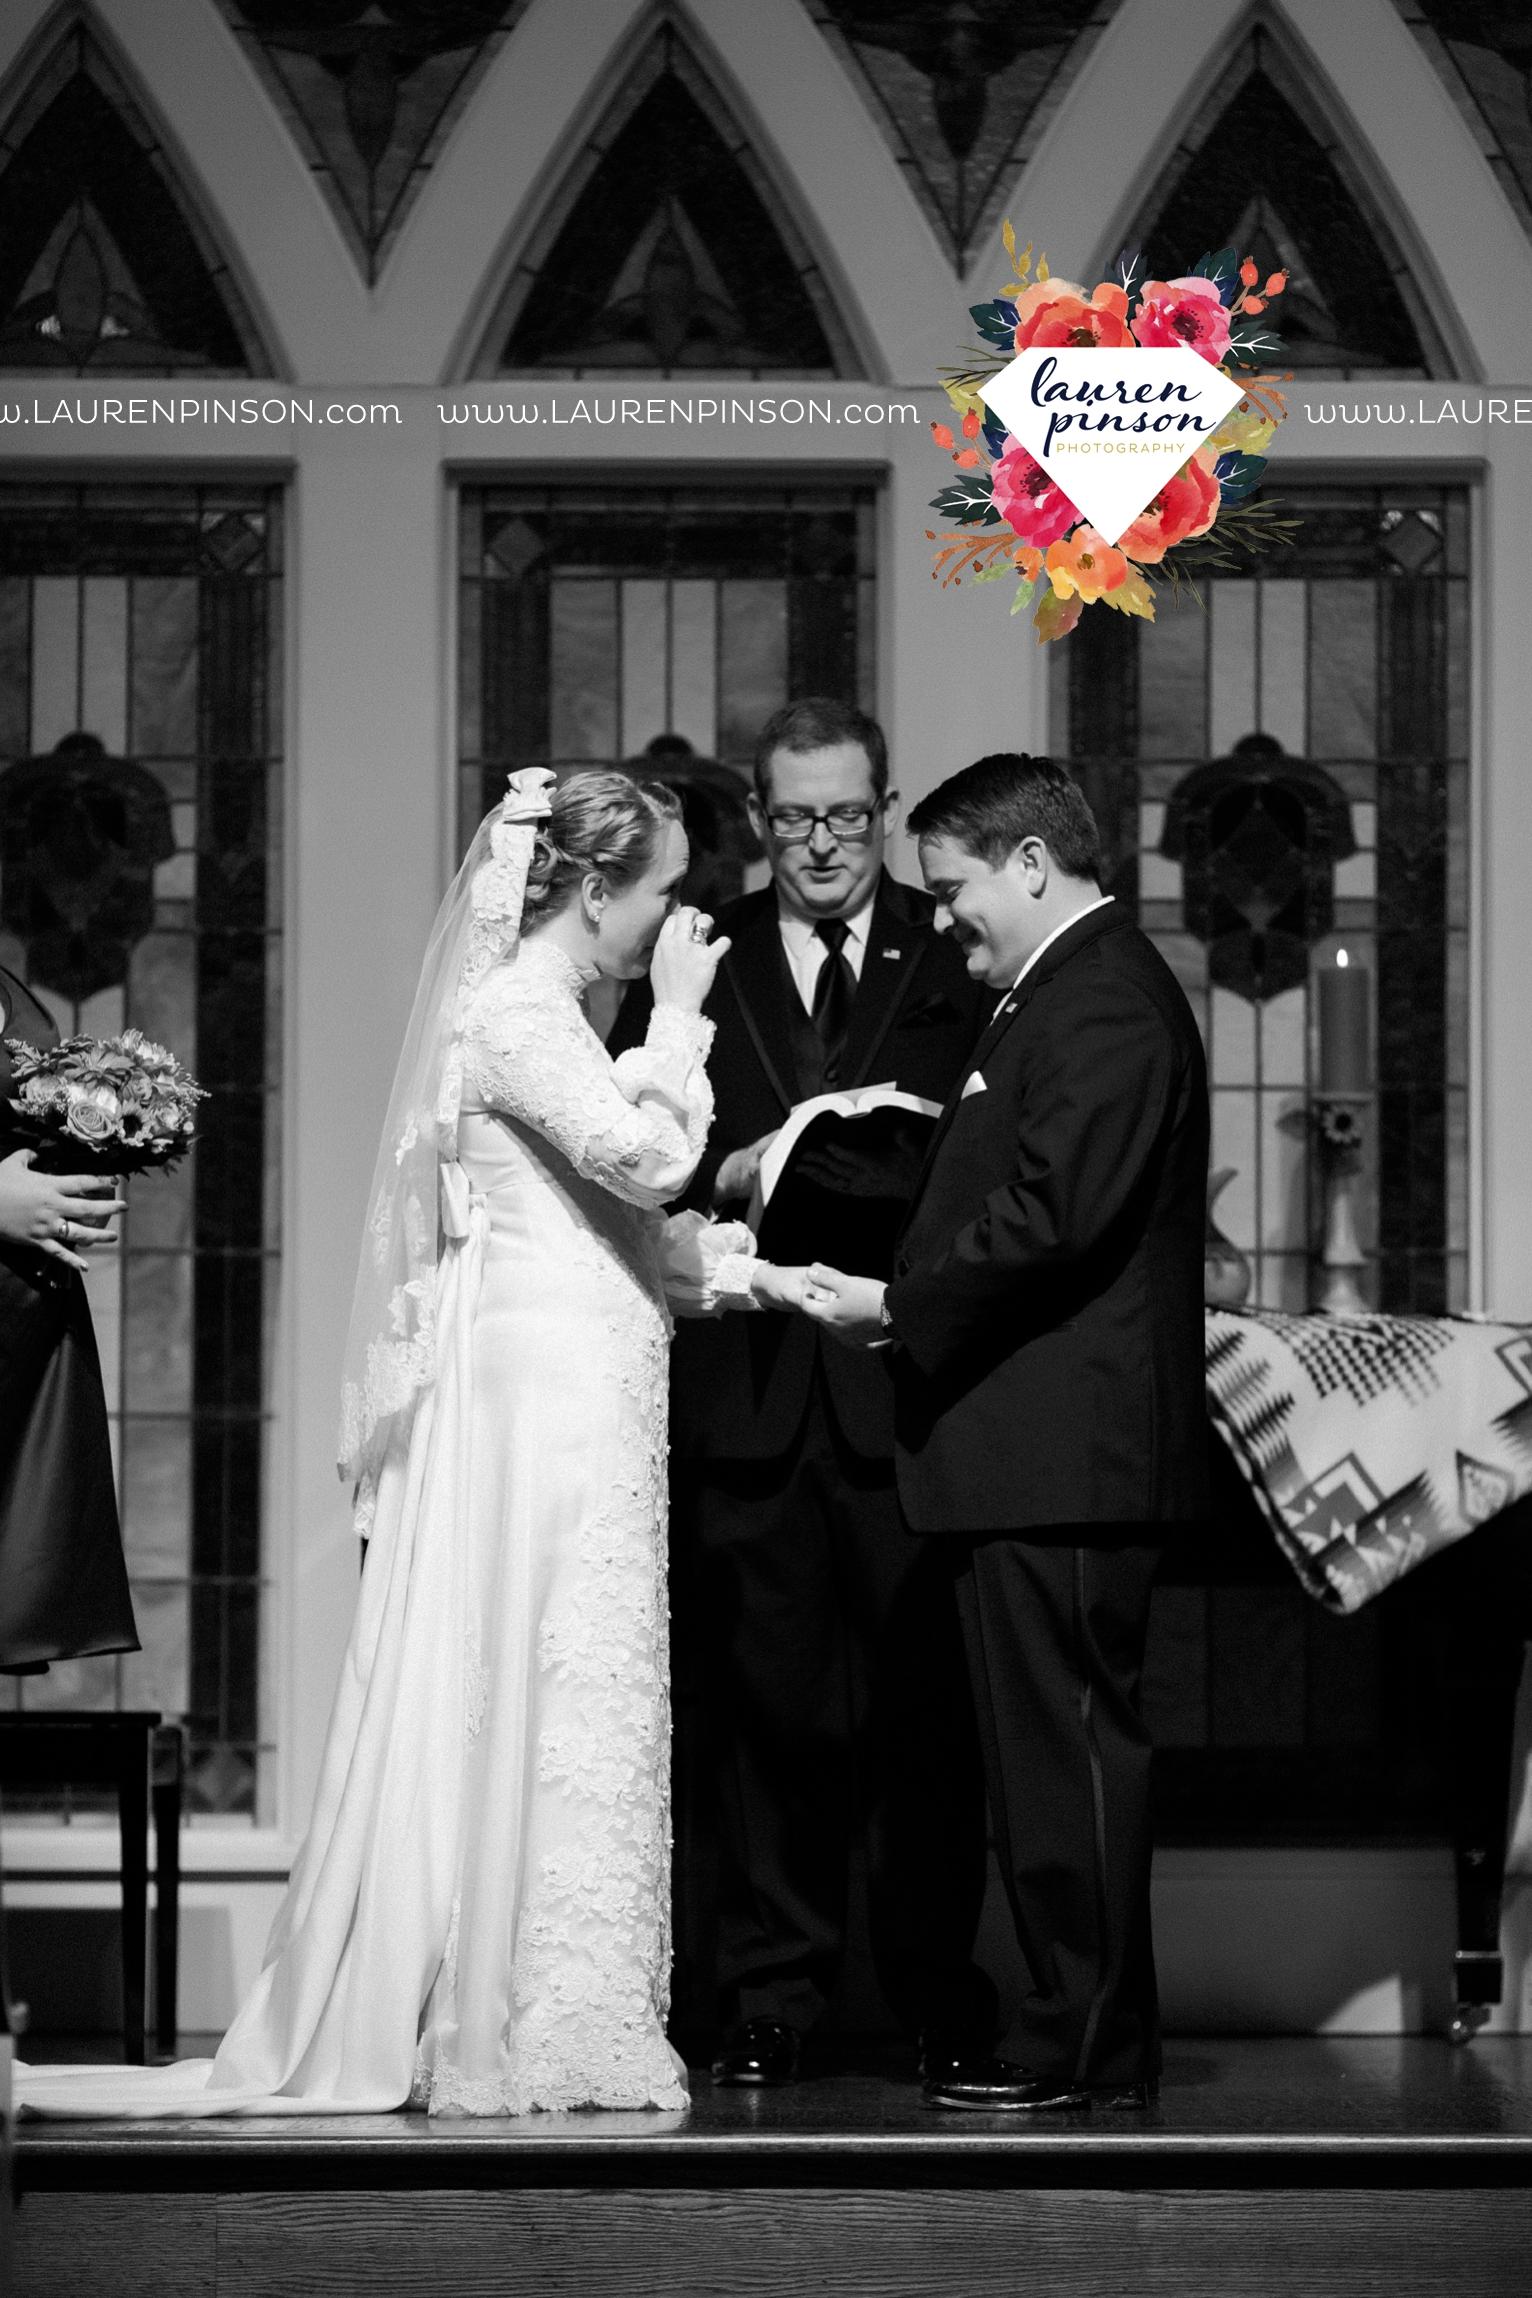 bells-texas-wedding-photography-at-willowood-ranch-chapel-north-texas-wichita-falls-wedding-photographer_1868.jpg